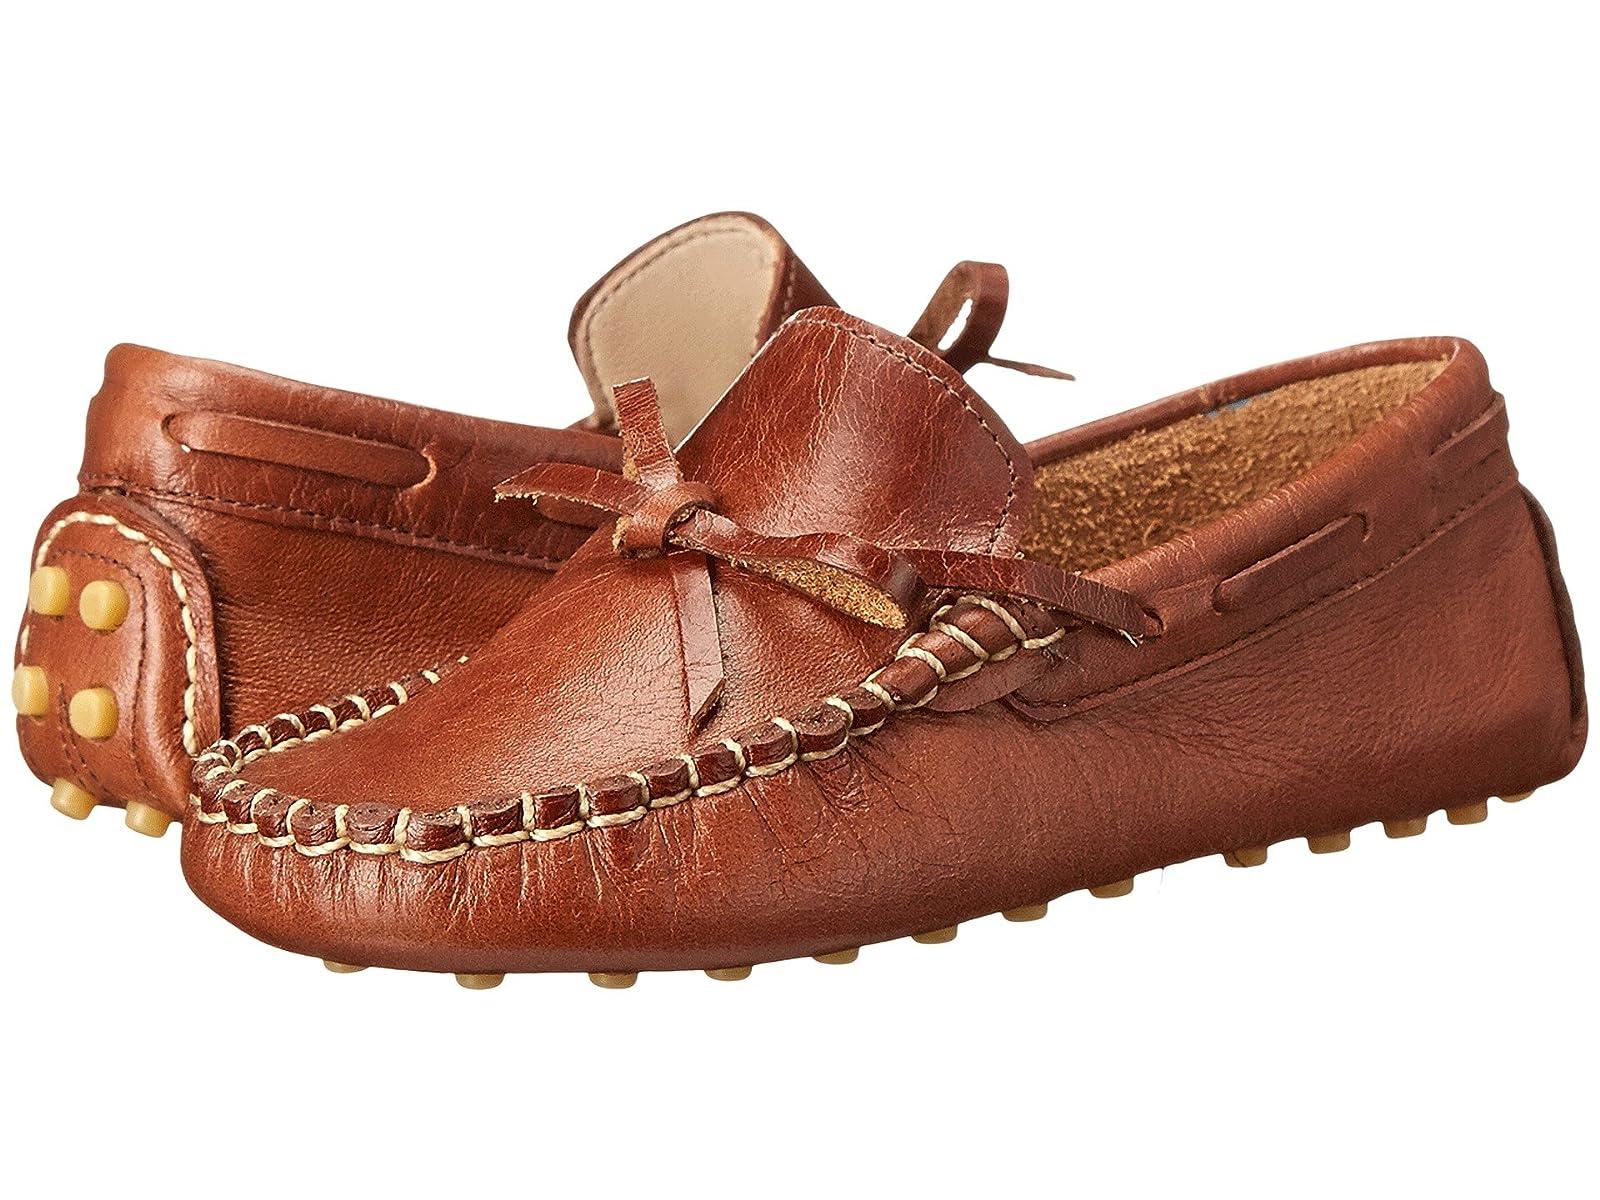 Elephantito Driver Loafers (Toddler/Little Kid/Big Kid)Atmospheric grades have affordable shoes